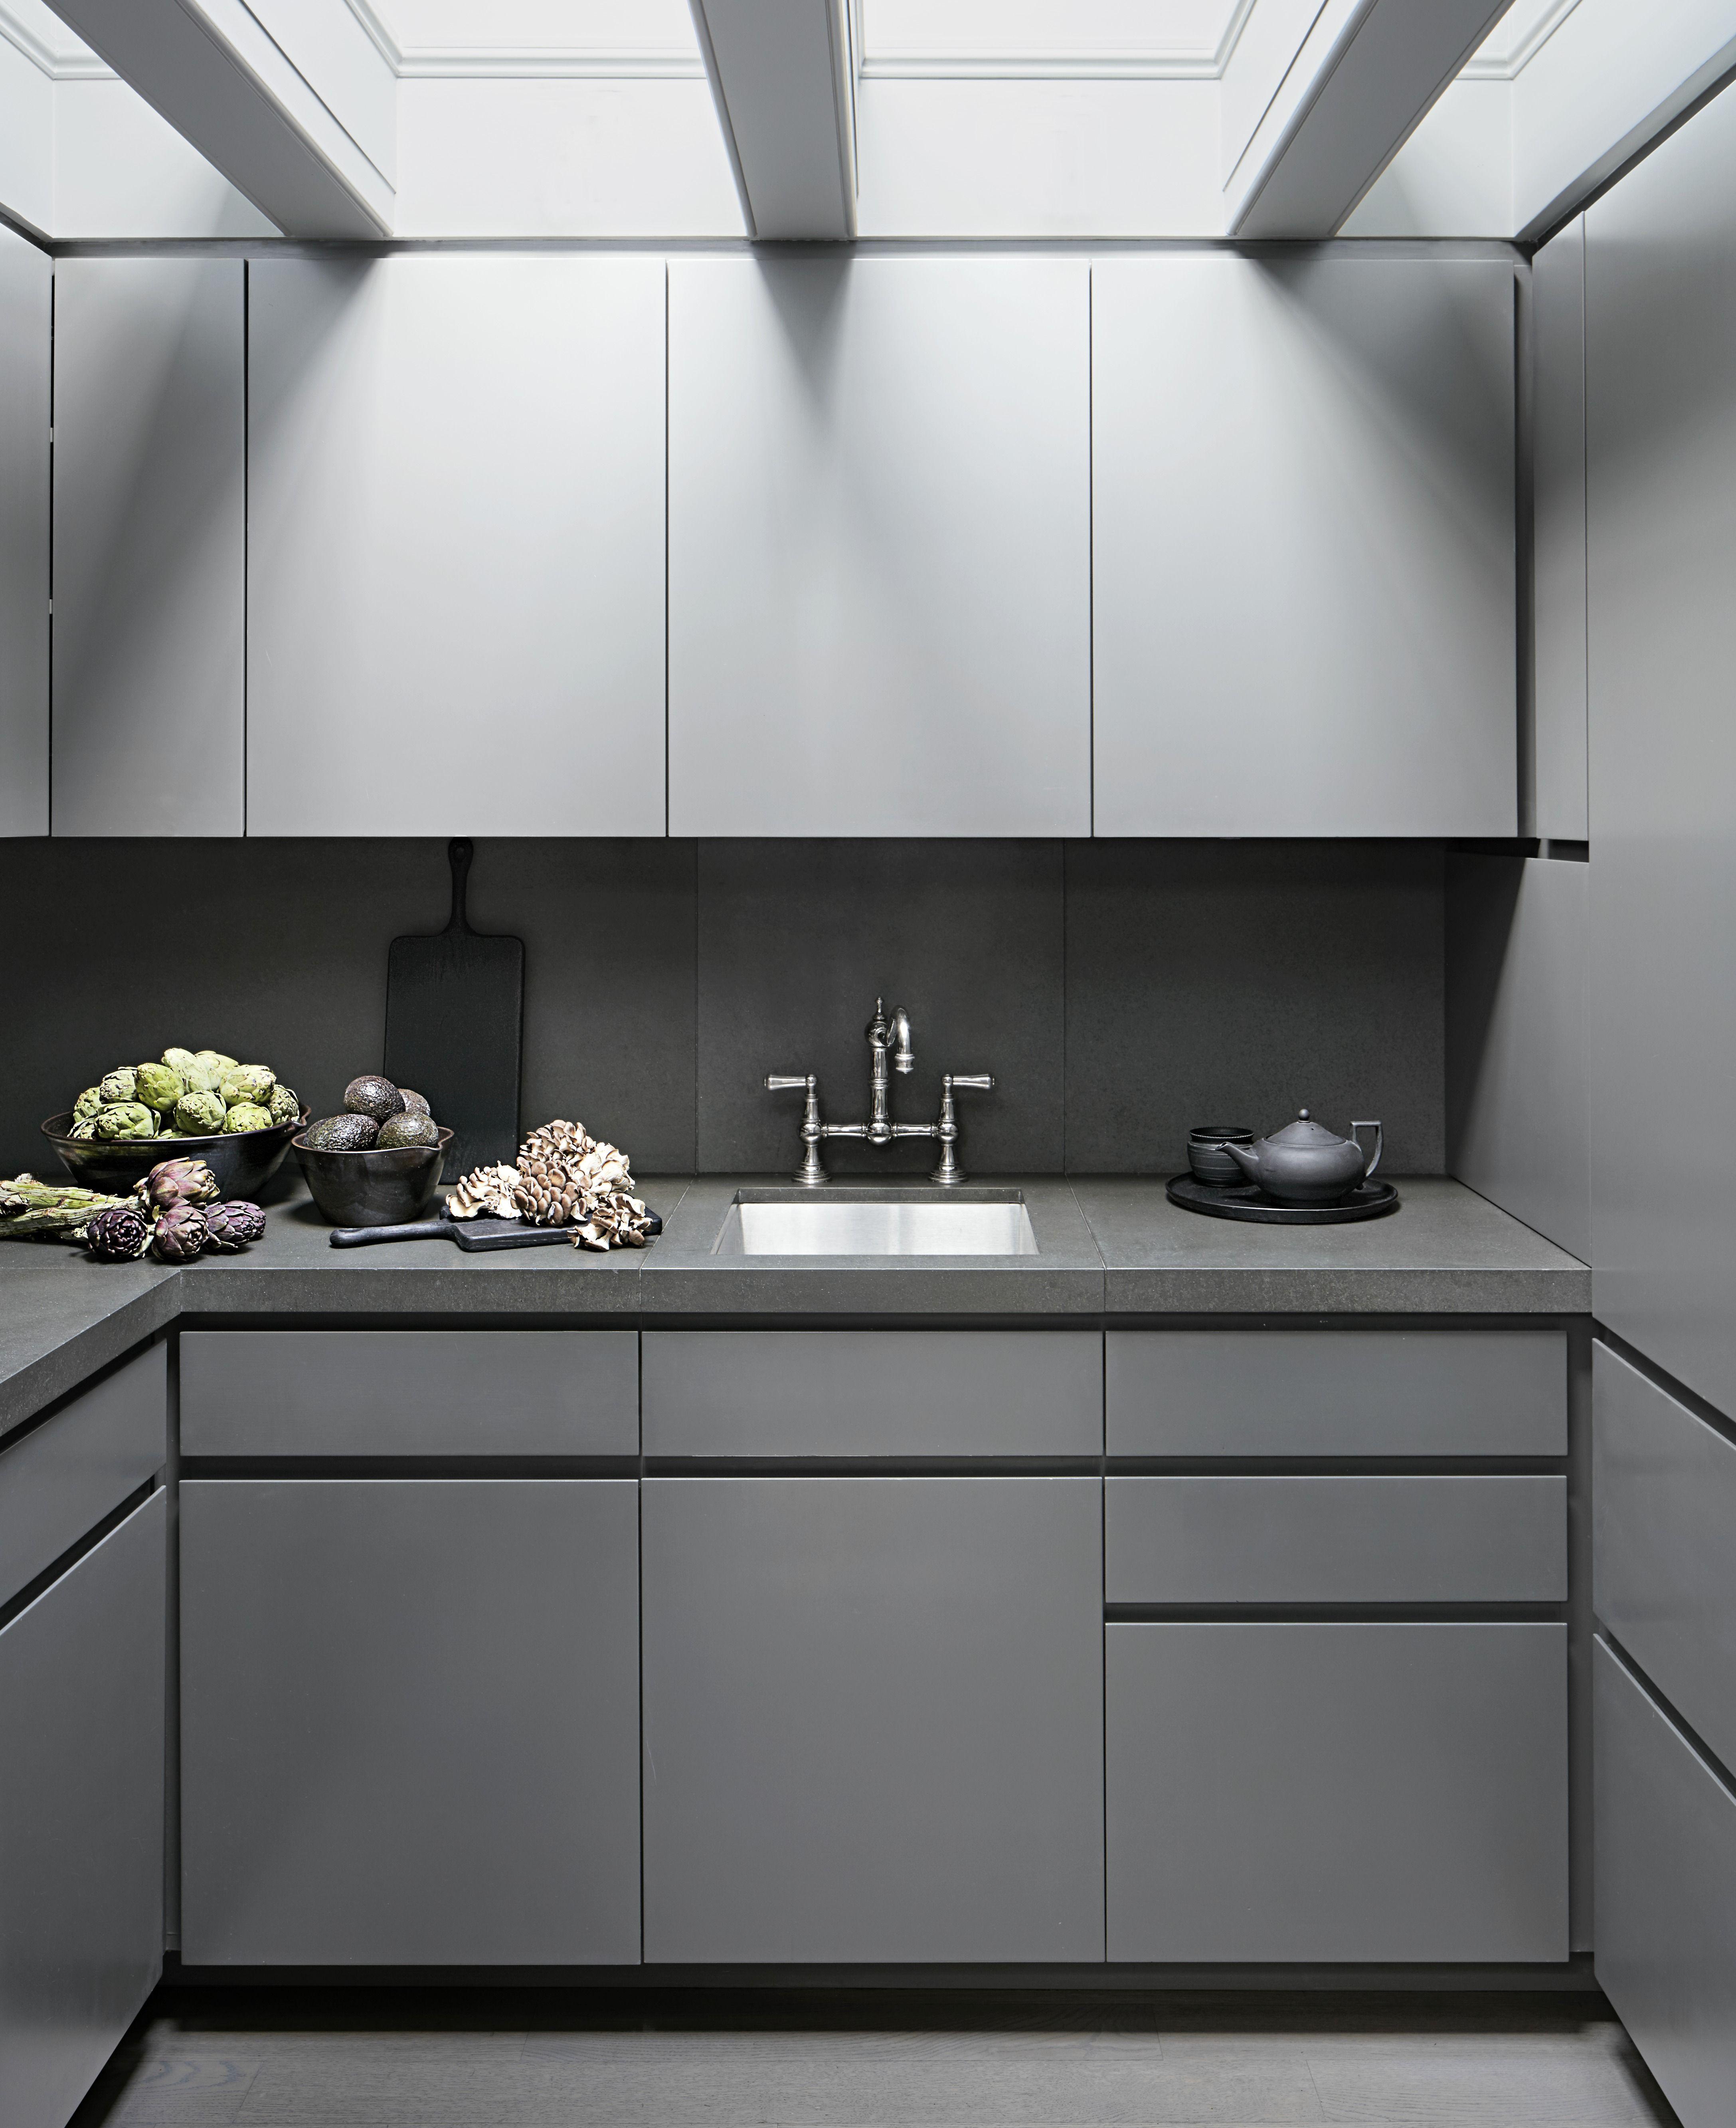 modern kitchen cabinets 23 modern kitchen cabinets ideas to try rh elledecor com